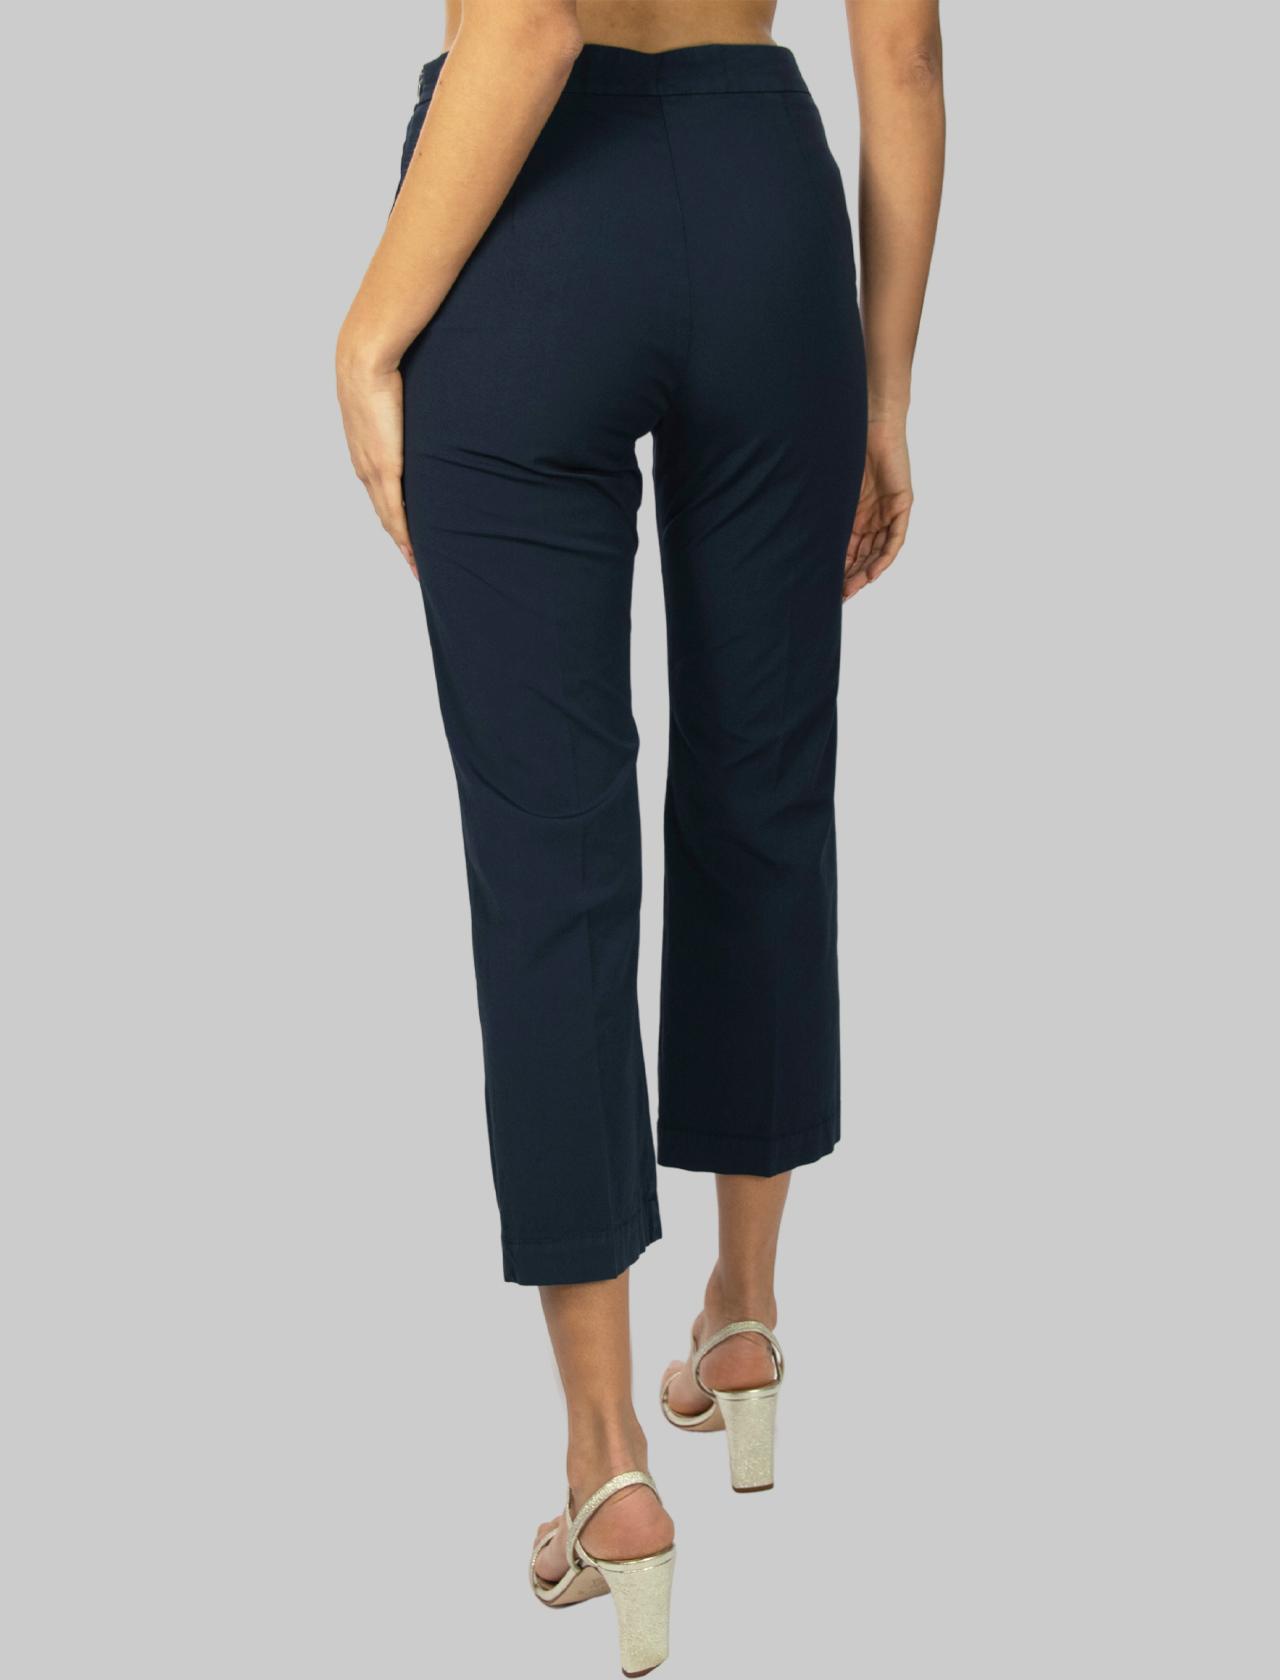 Women's Clothing Stretch Satin Cotton Pants Navy Blue Maliparmi | Skirts and Pants | JH71441013780000